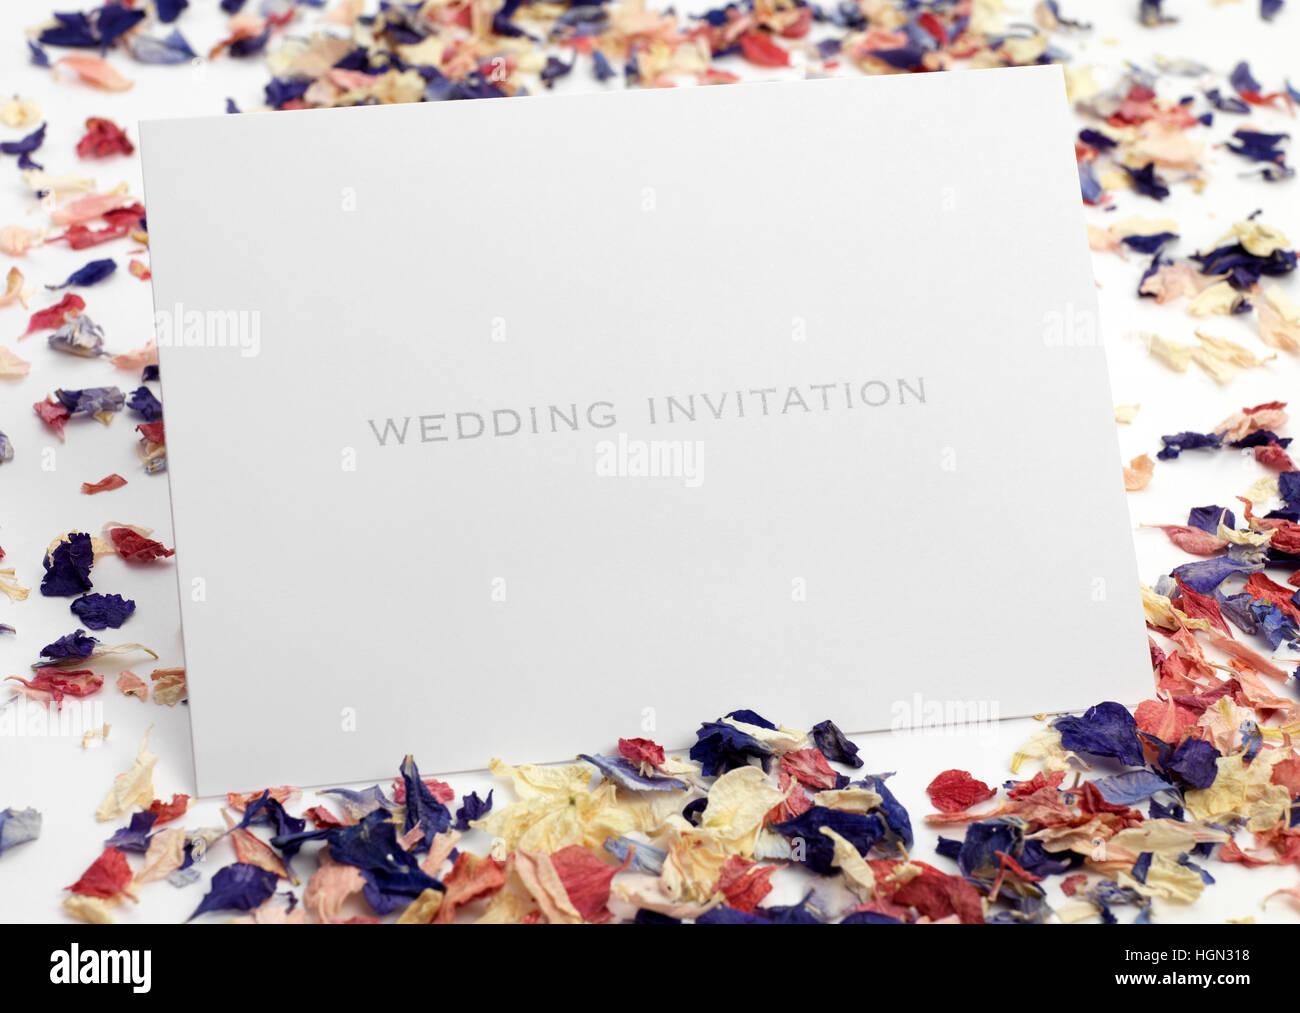 Bride and Groom wedding invitation - Stock Image